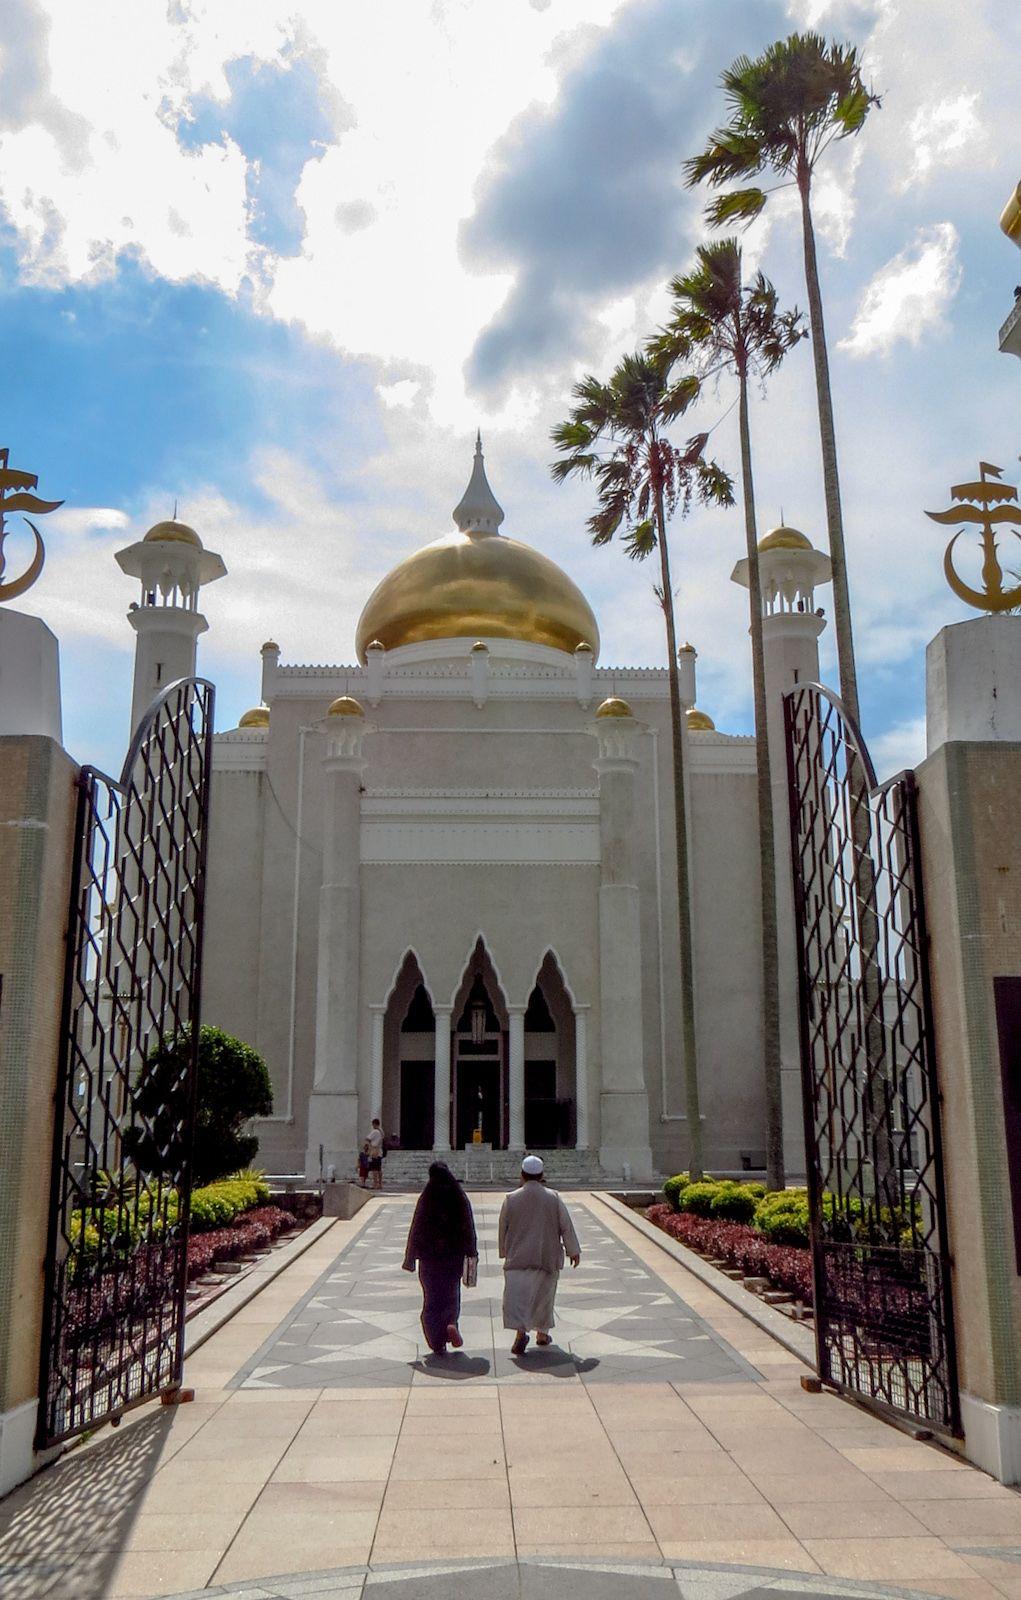 Bypass Brunei Its Boring Flashpacking Travel Blog Brunei Travel Beautiful Mosques Architecture